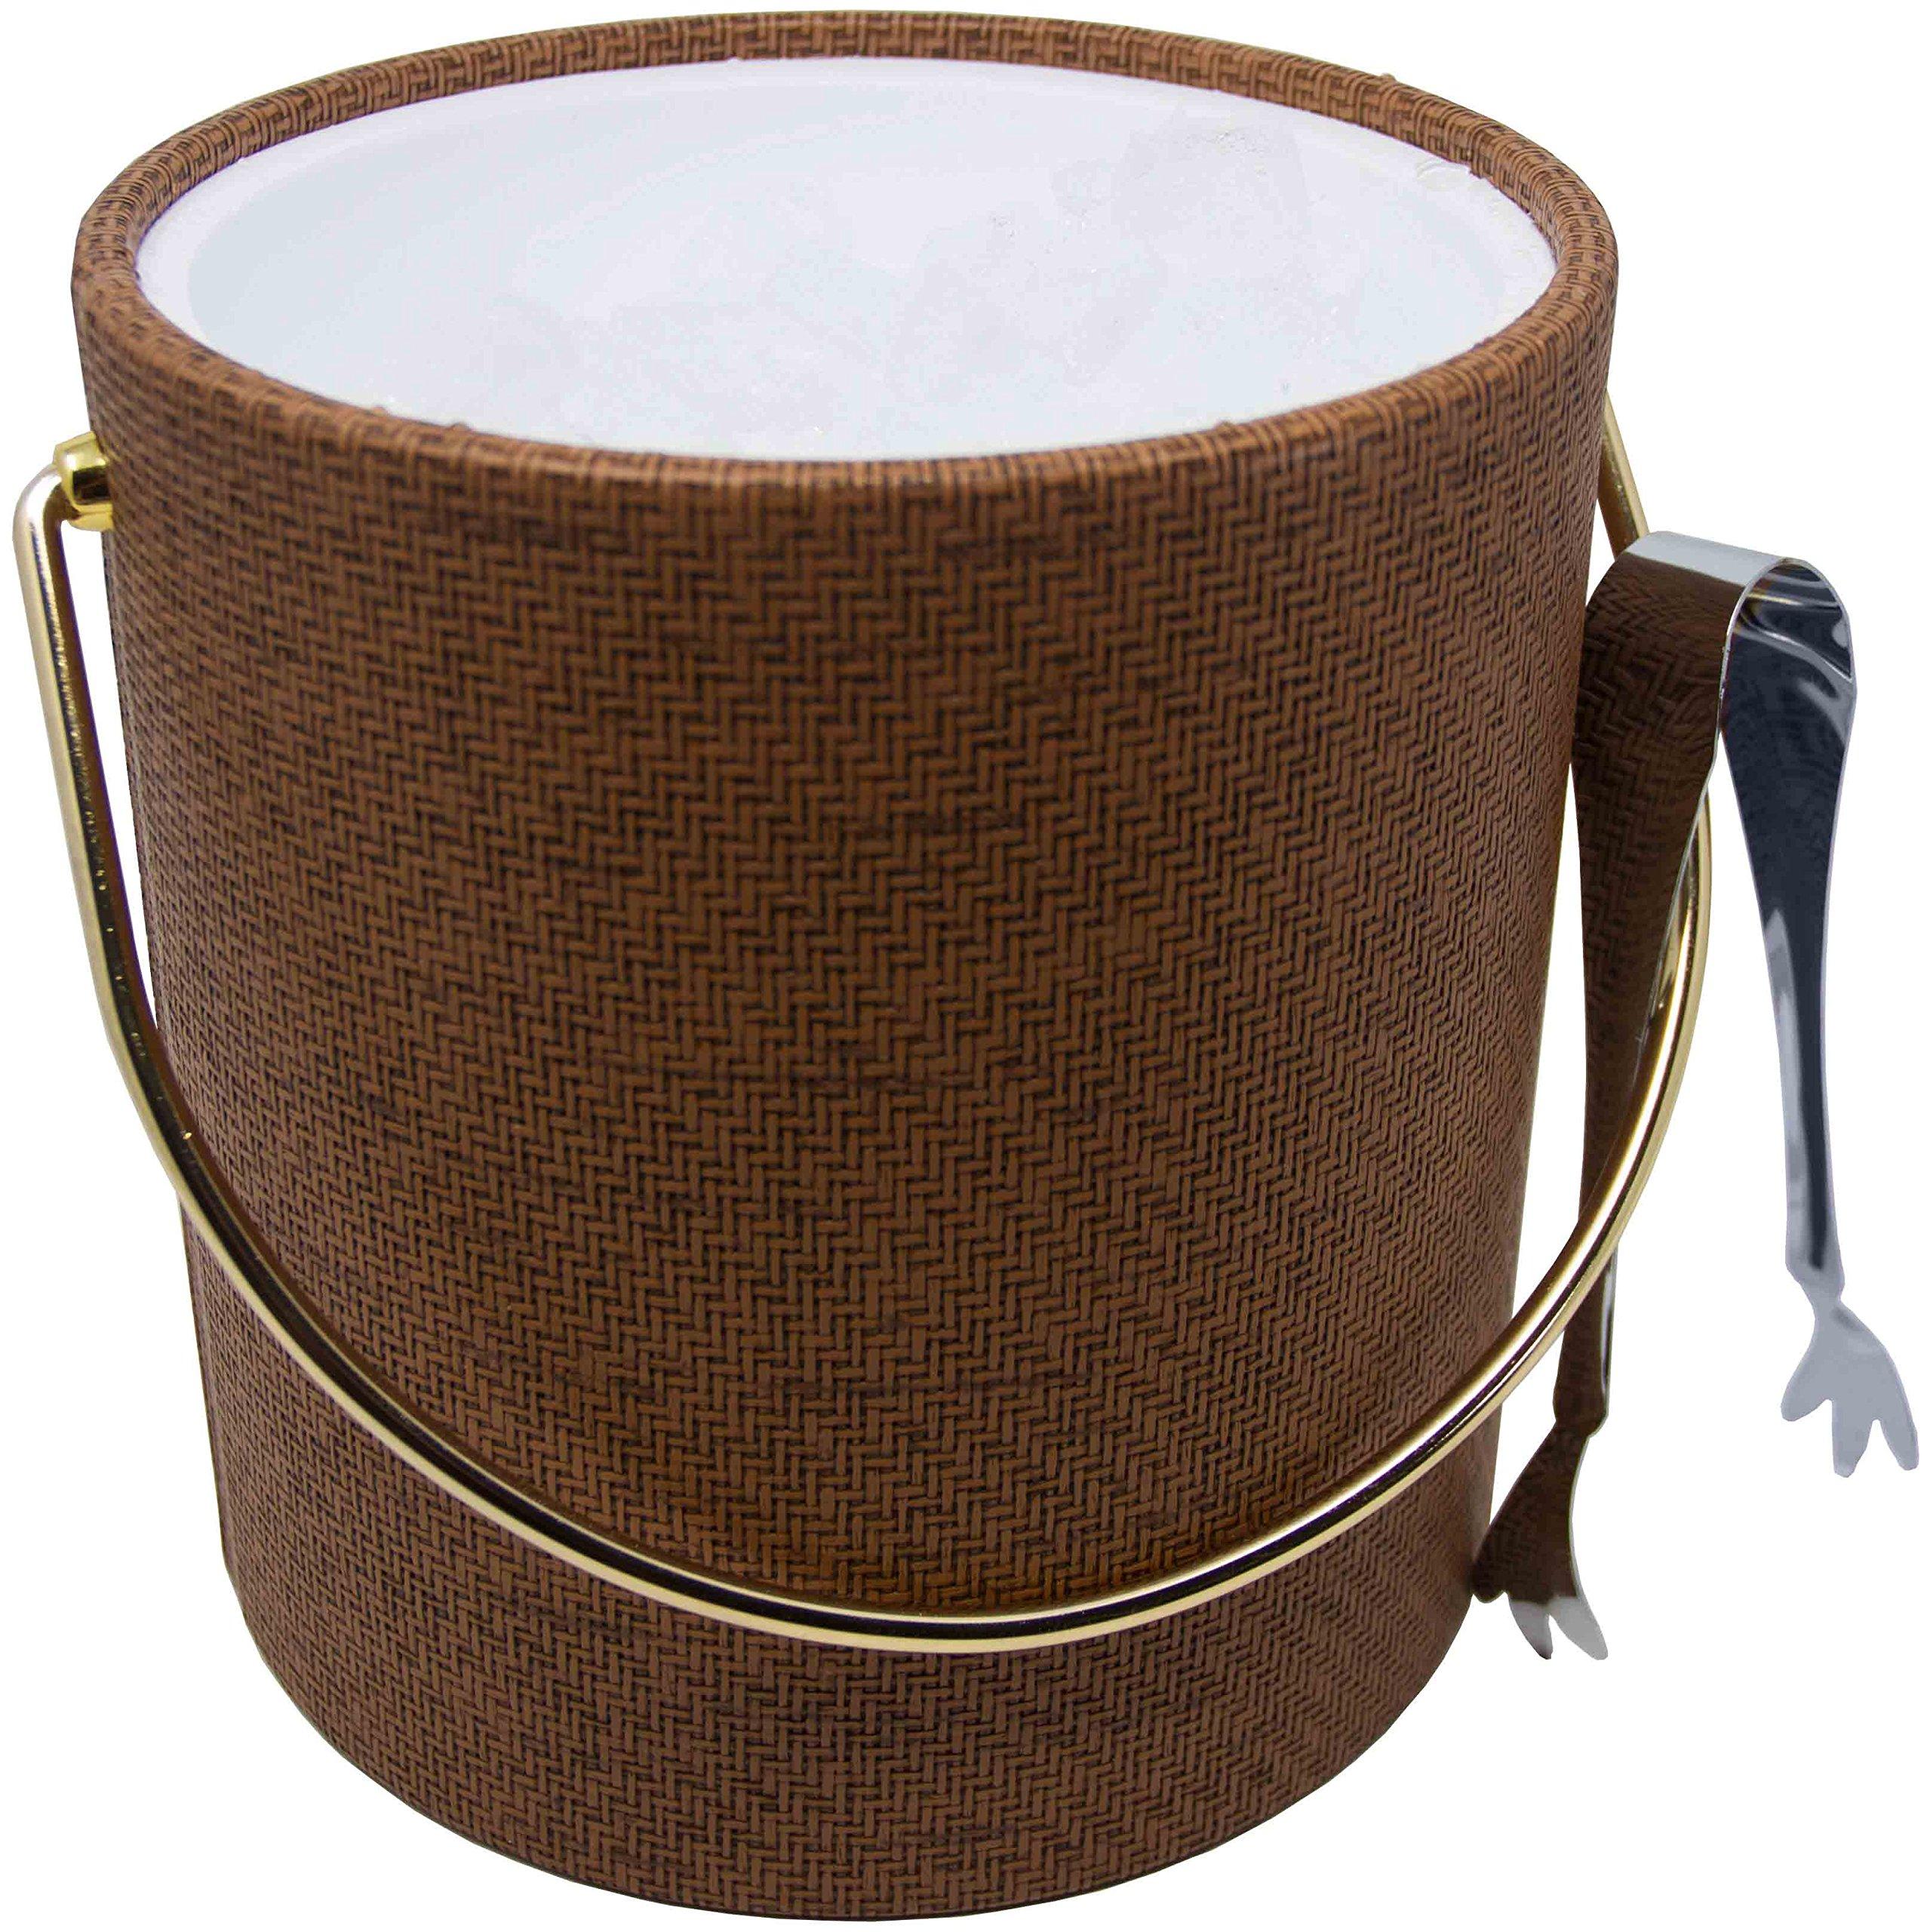 Hand Made In USA Beachwood Wicker Double Walled 3-Quart Insulated Ice Bucket With Bonus Ice Tongs